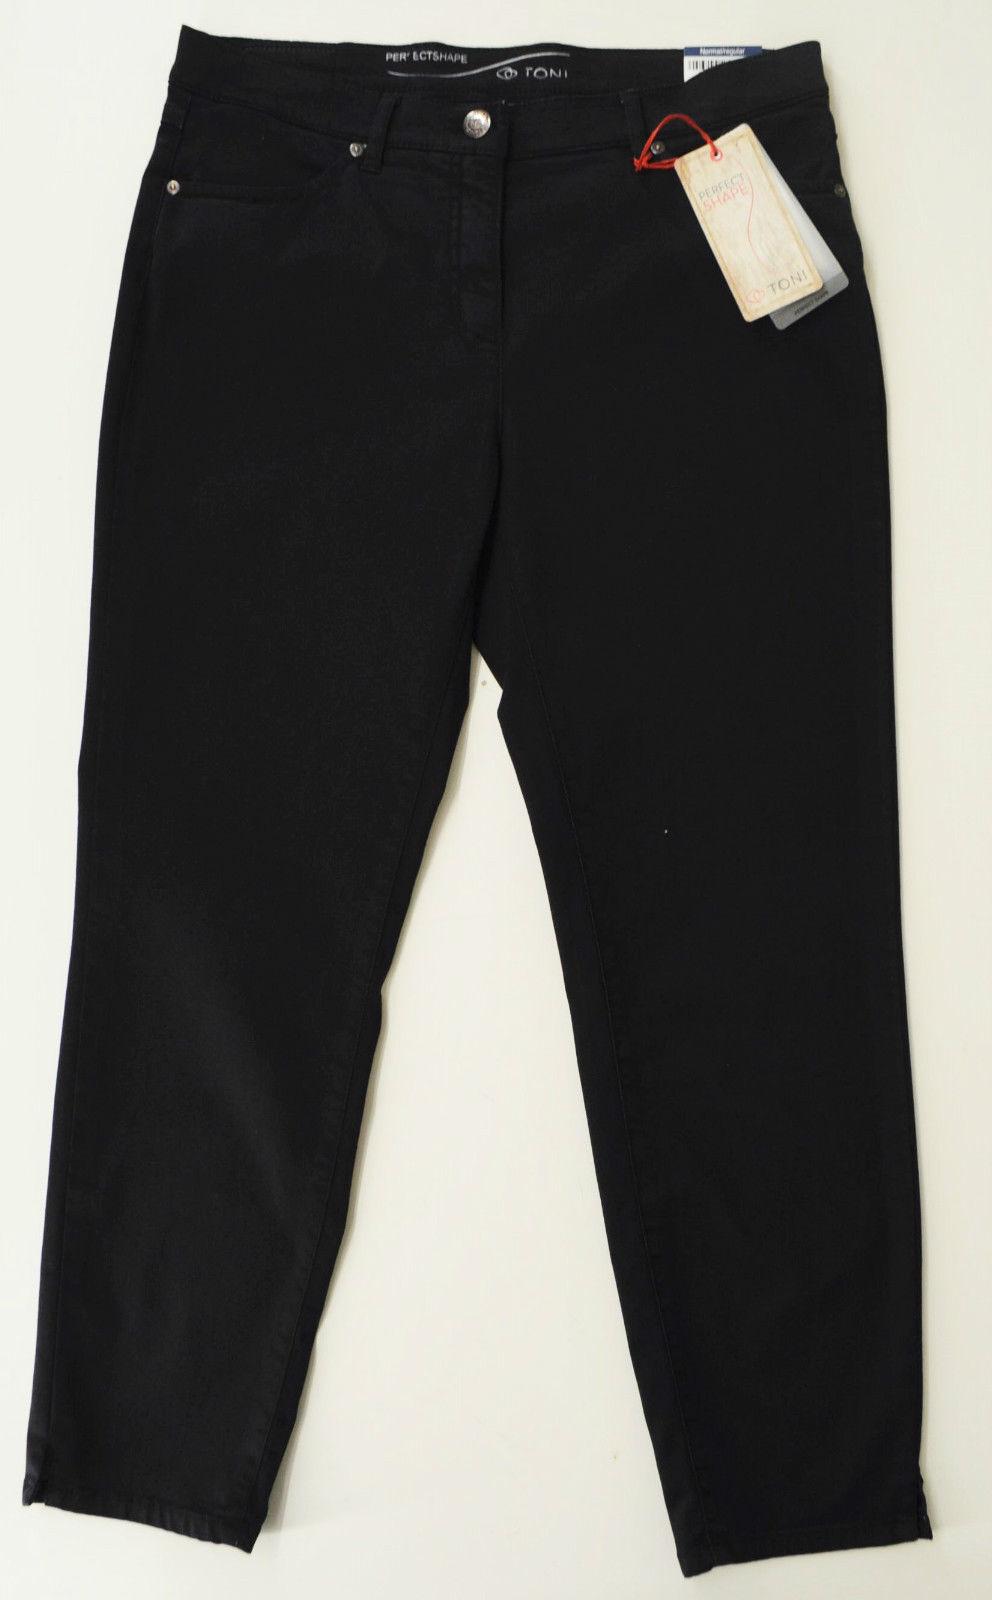 Toni Fashion,  Perfect Shape , modische 7 8 Hose in Marine, Stretch, Gr. wähbar